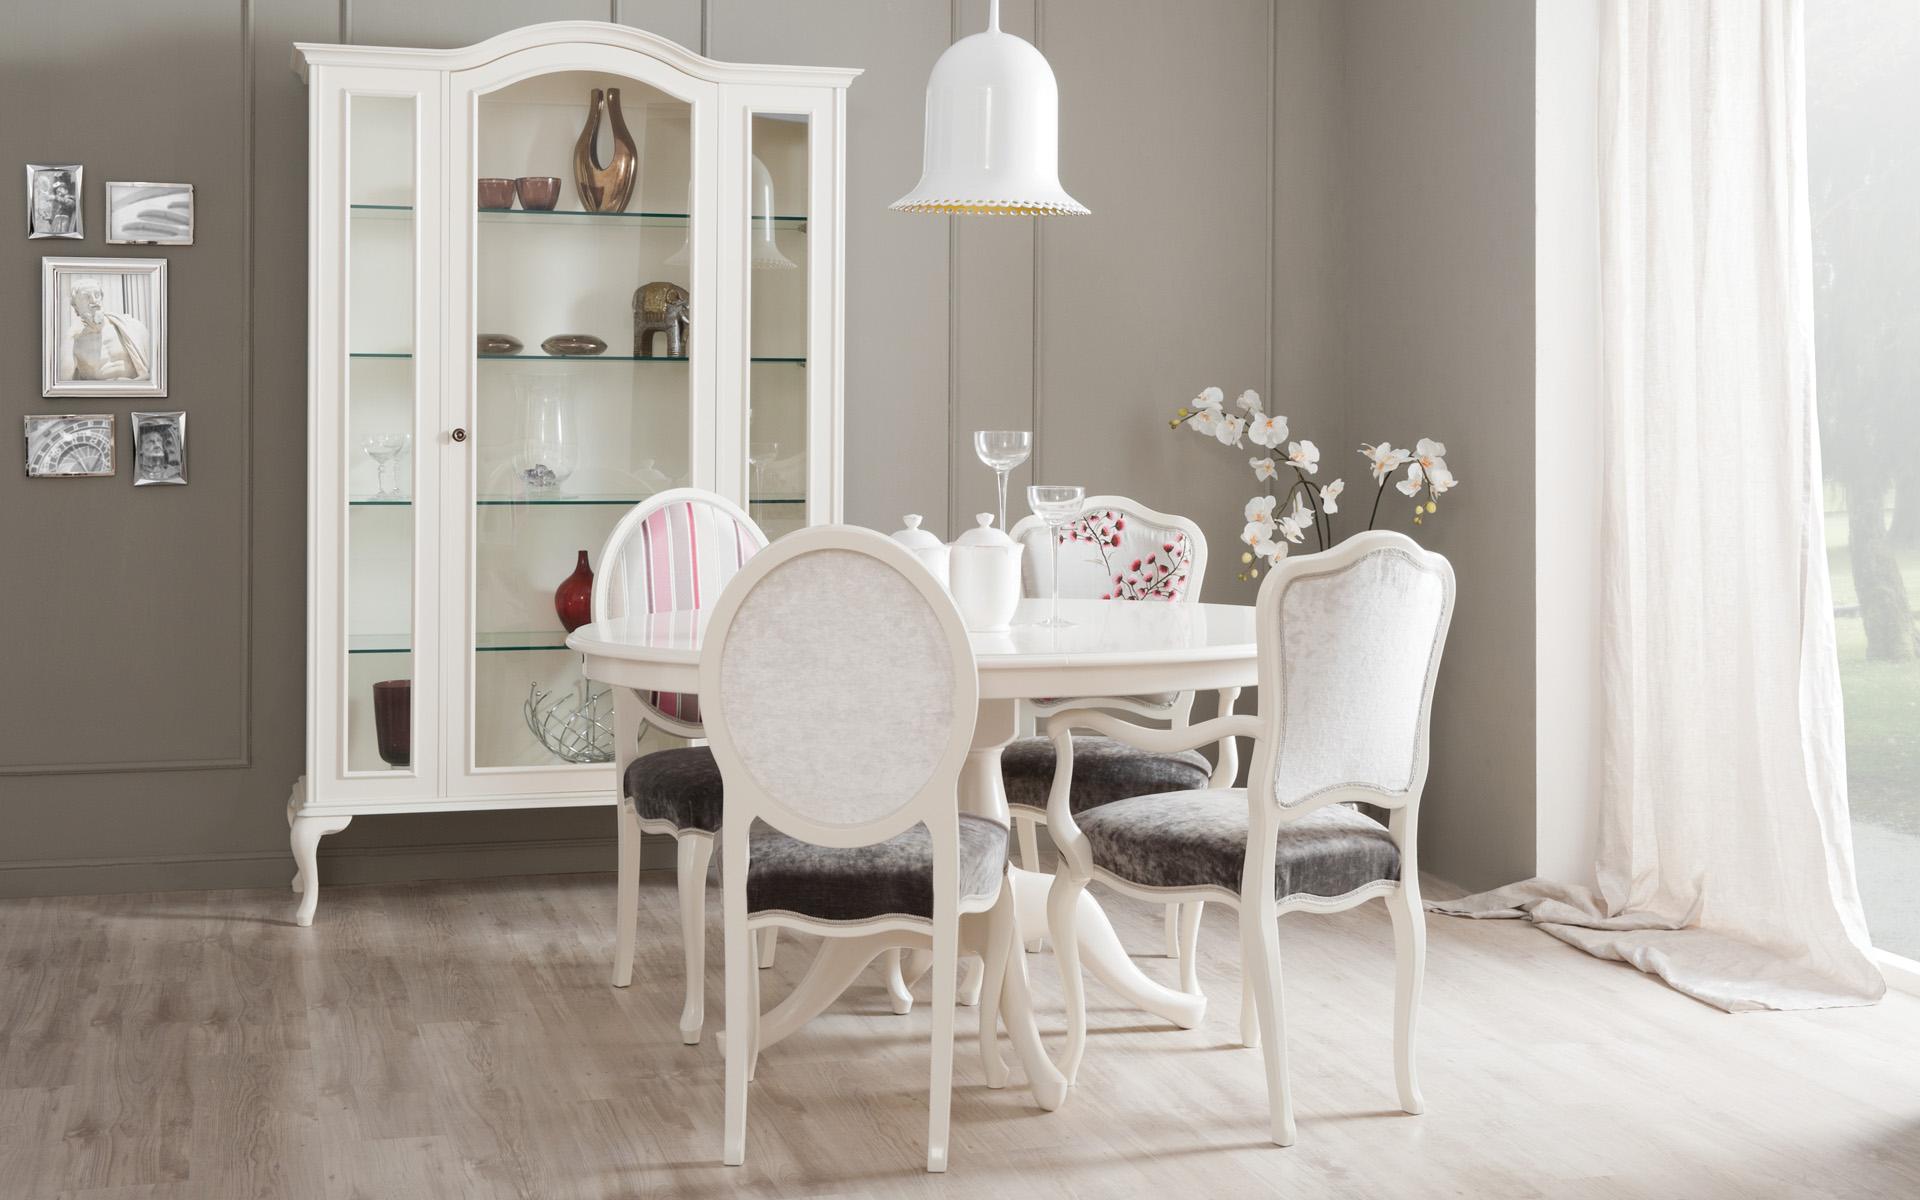 jedilnica_Esszimmer_dining-room_Beli-barok_klasicno-pohistvo_classic-furniture_Klassischen-Moebel_09